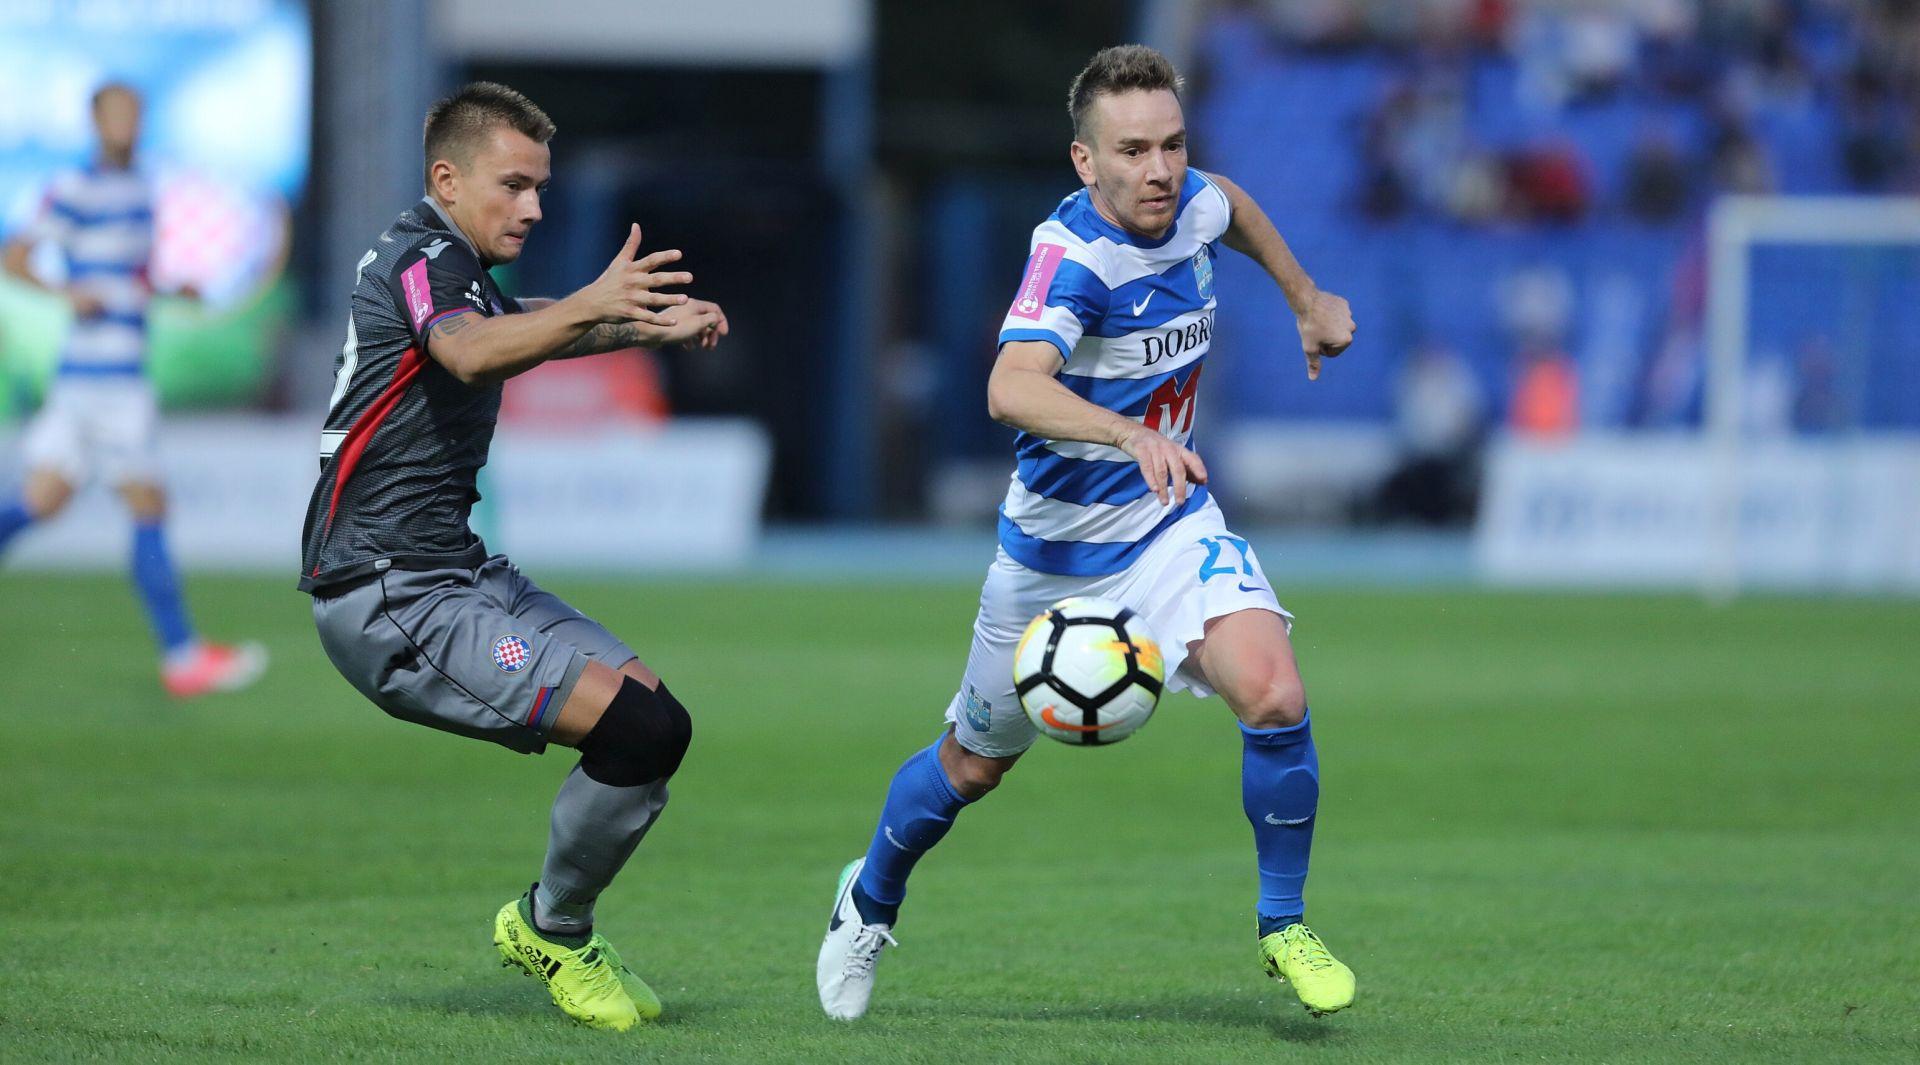 VIDEO: GREZDA ZA 3 BODA U 3. MINUTI NADOKNADE Osijek – Hajduk 2-1